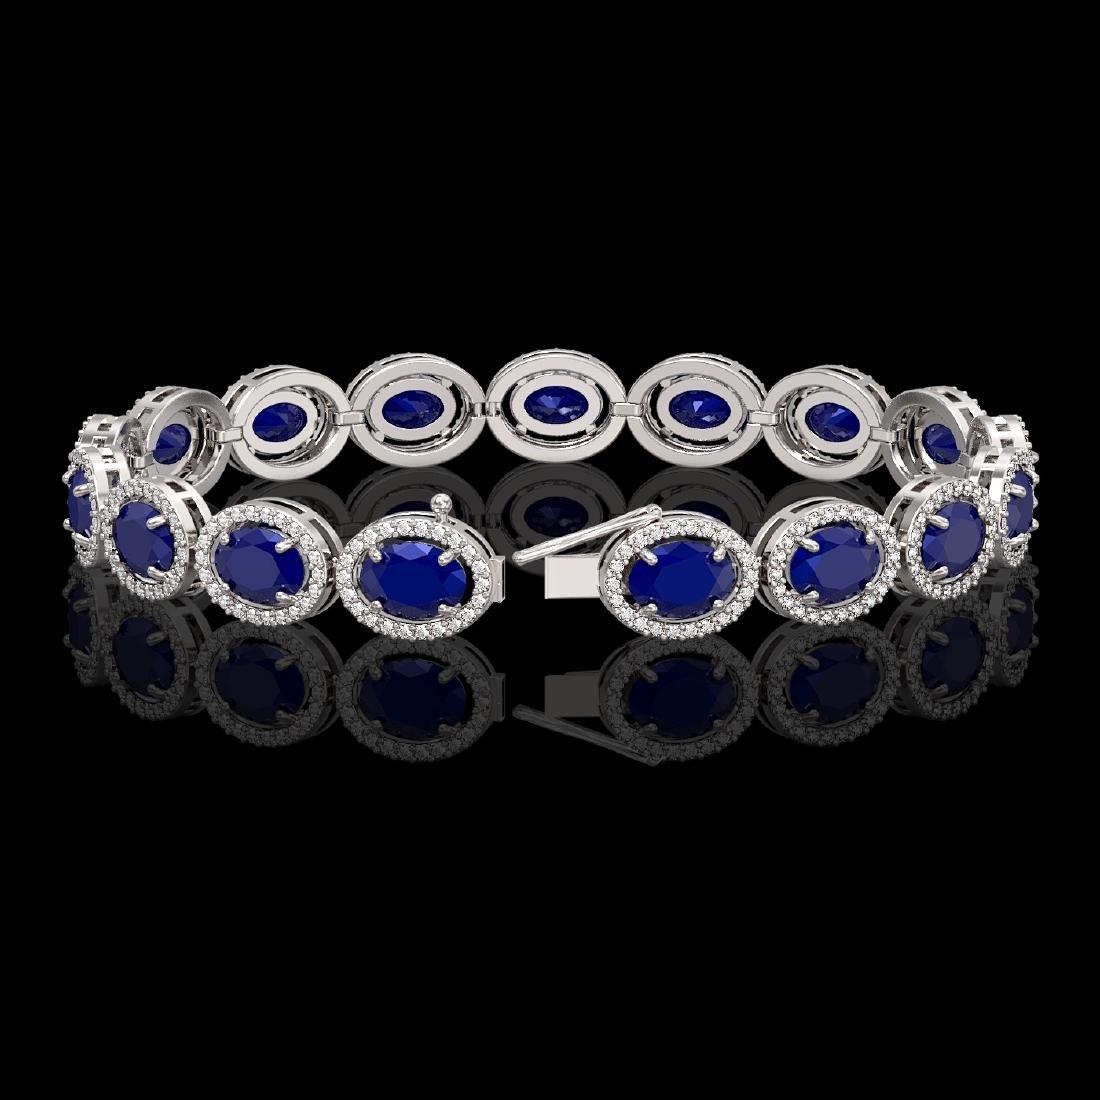 22.89 CTW Sapphire & Diamond Halo Bracelet 10K White - 2